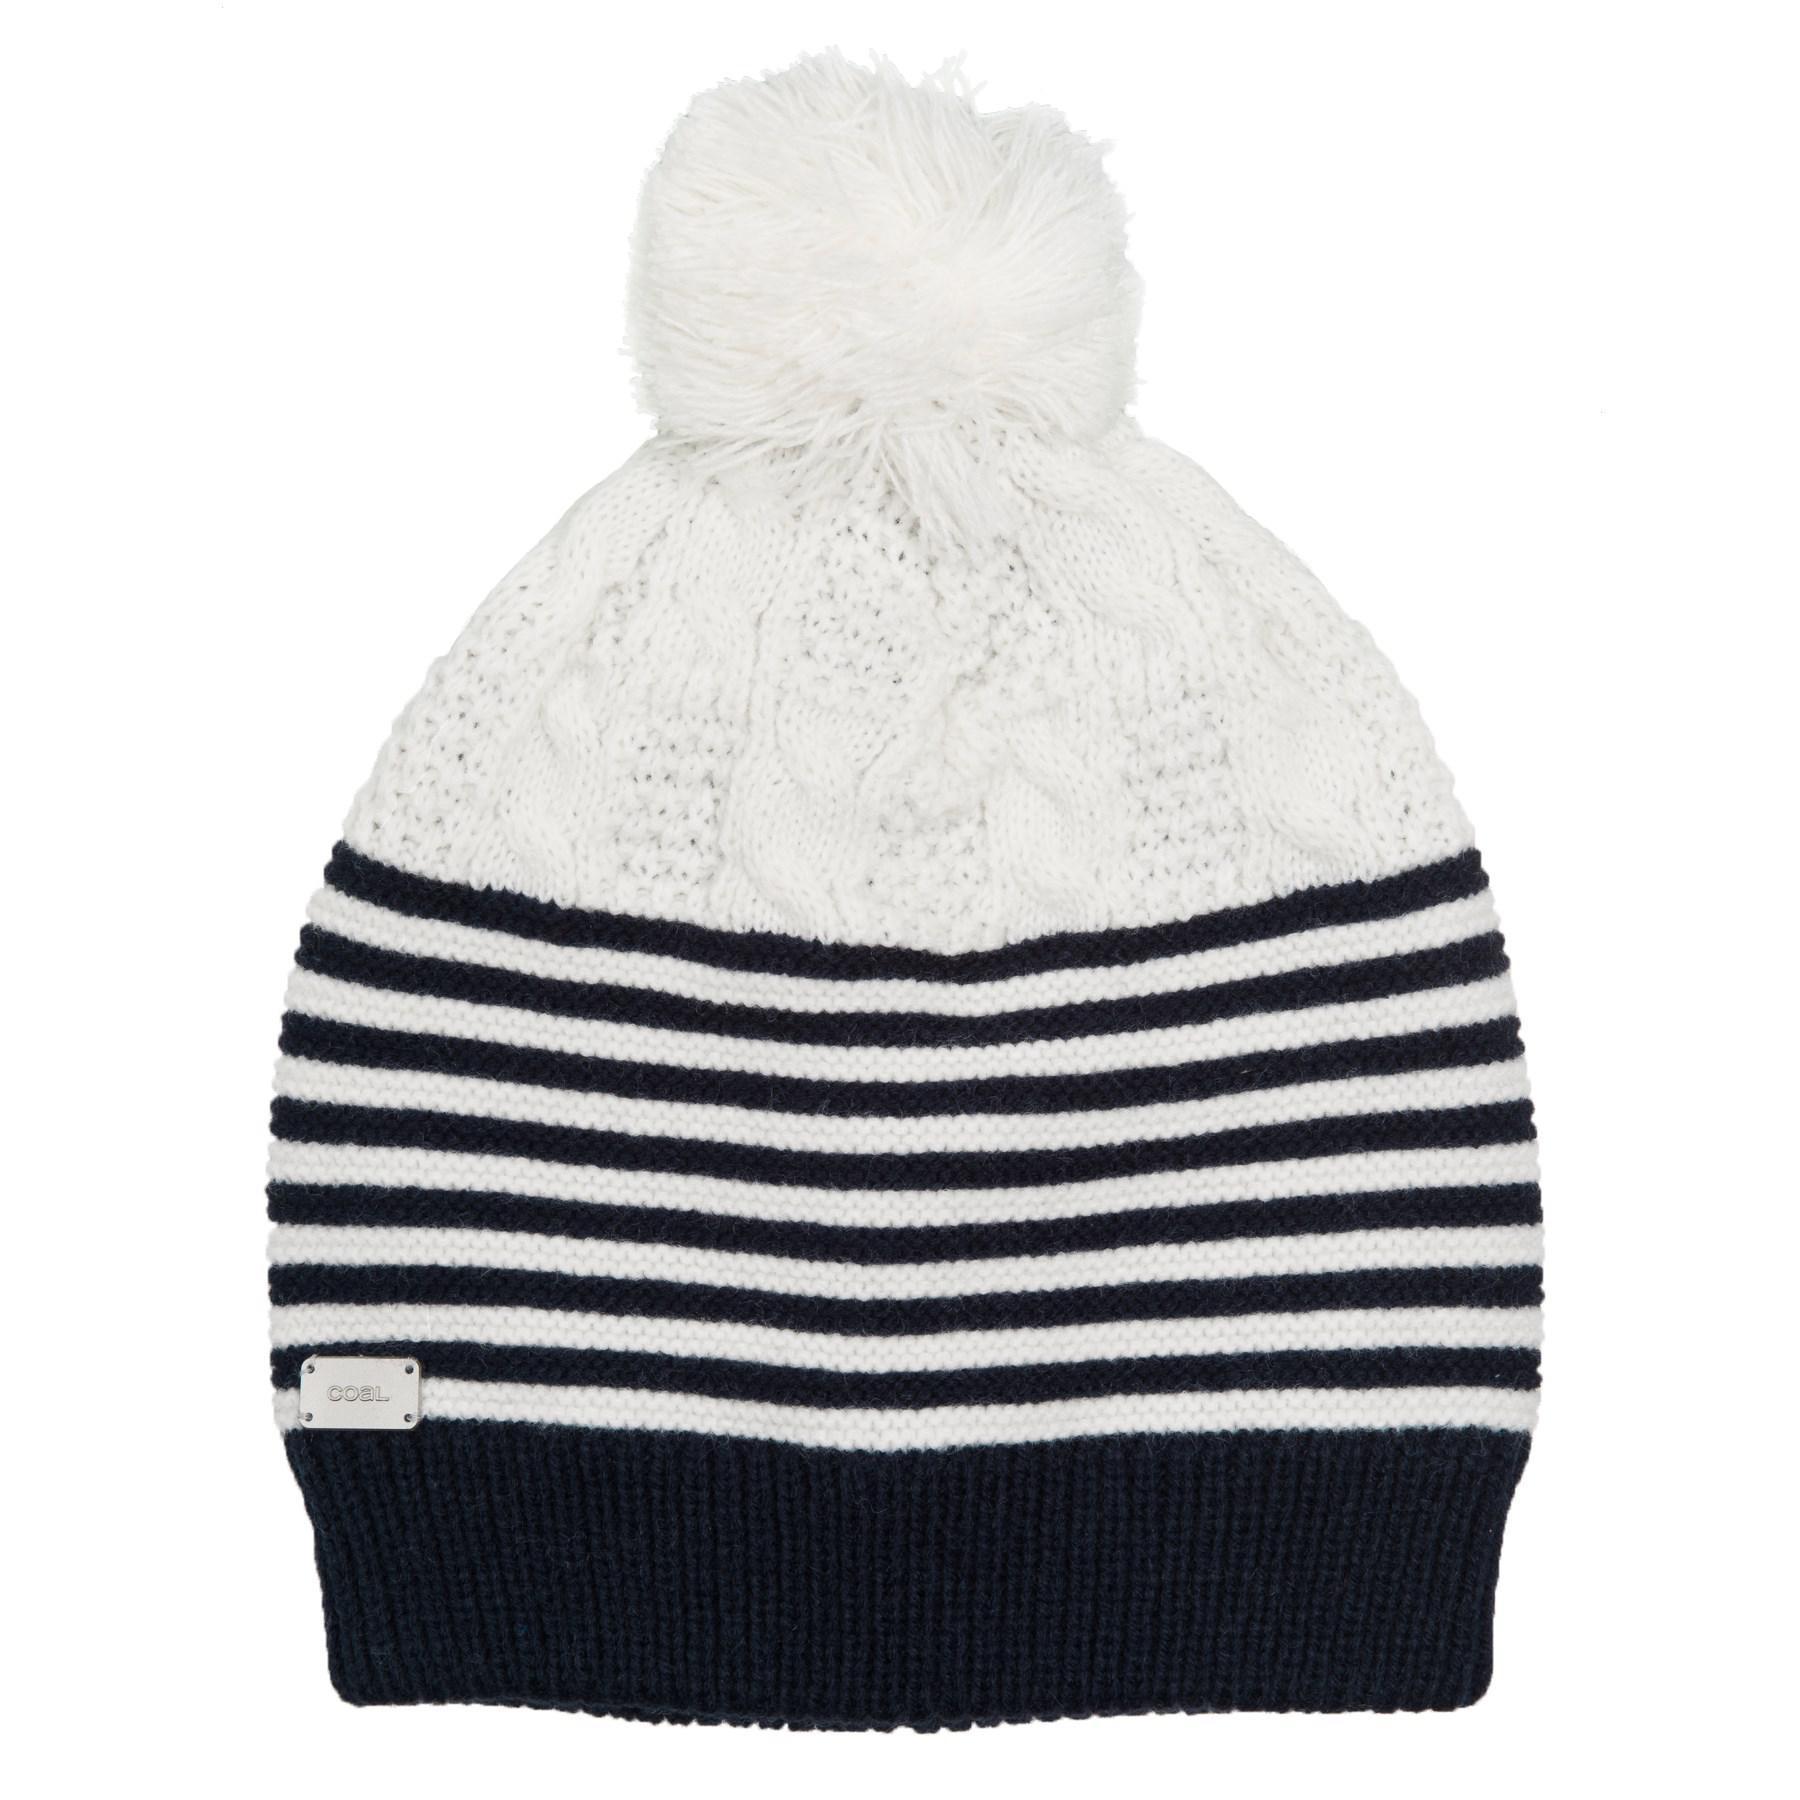 Lyst - Coal The Sweater Beanie (for Men) for Men 3da47c3d4fb